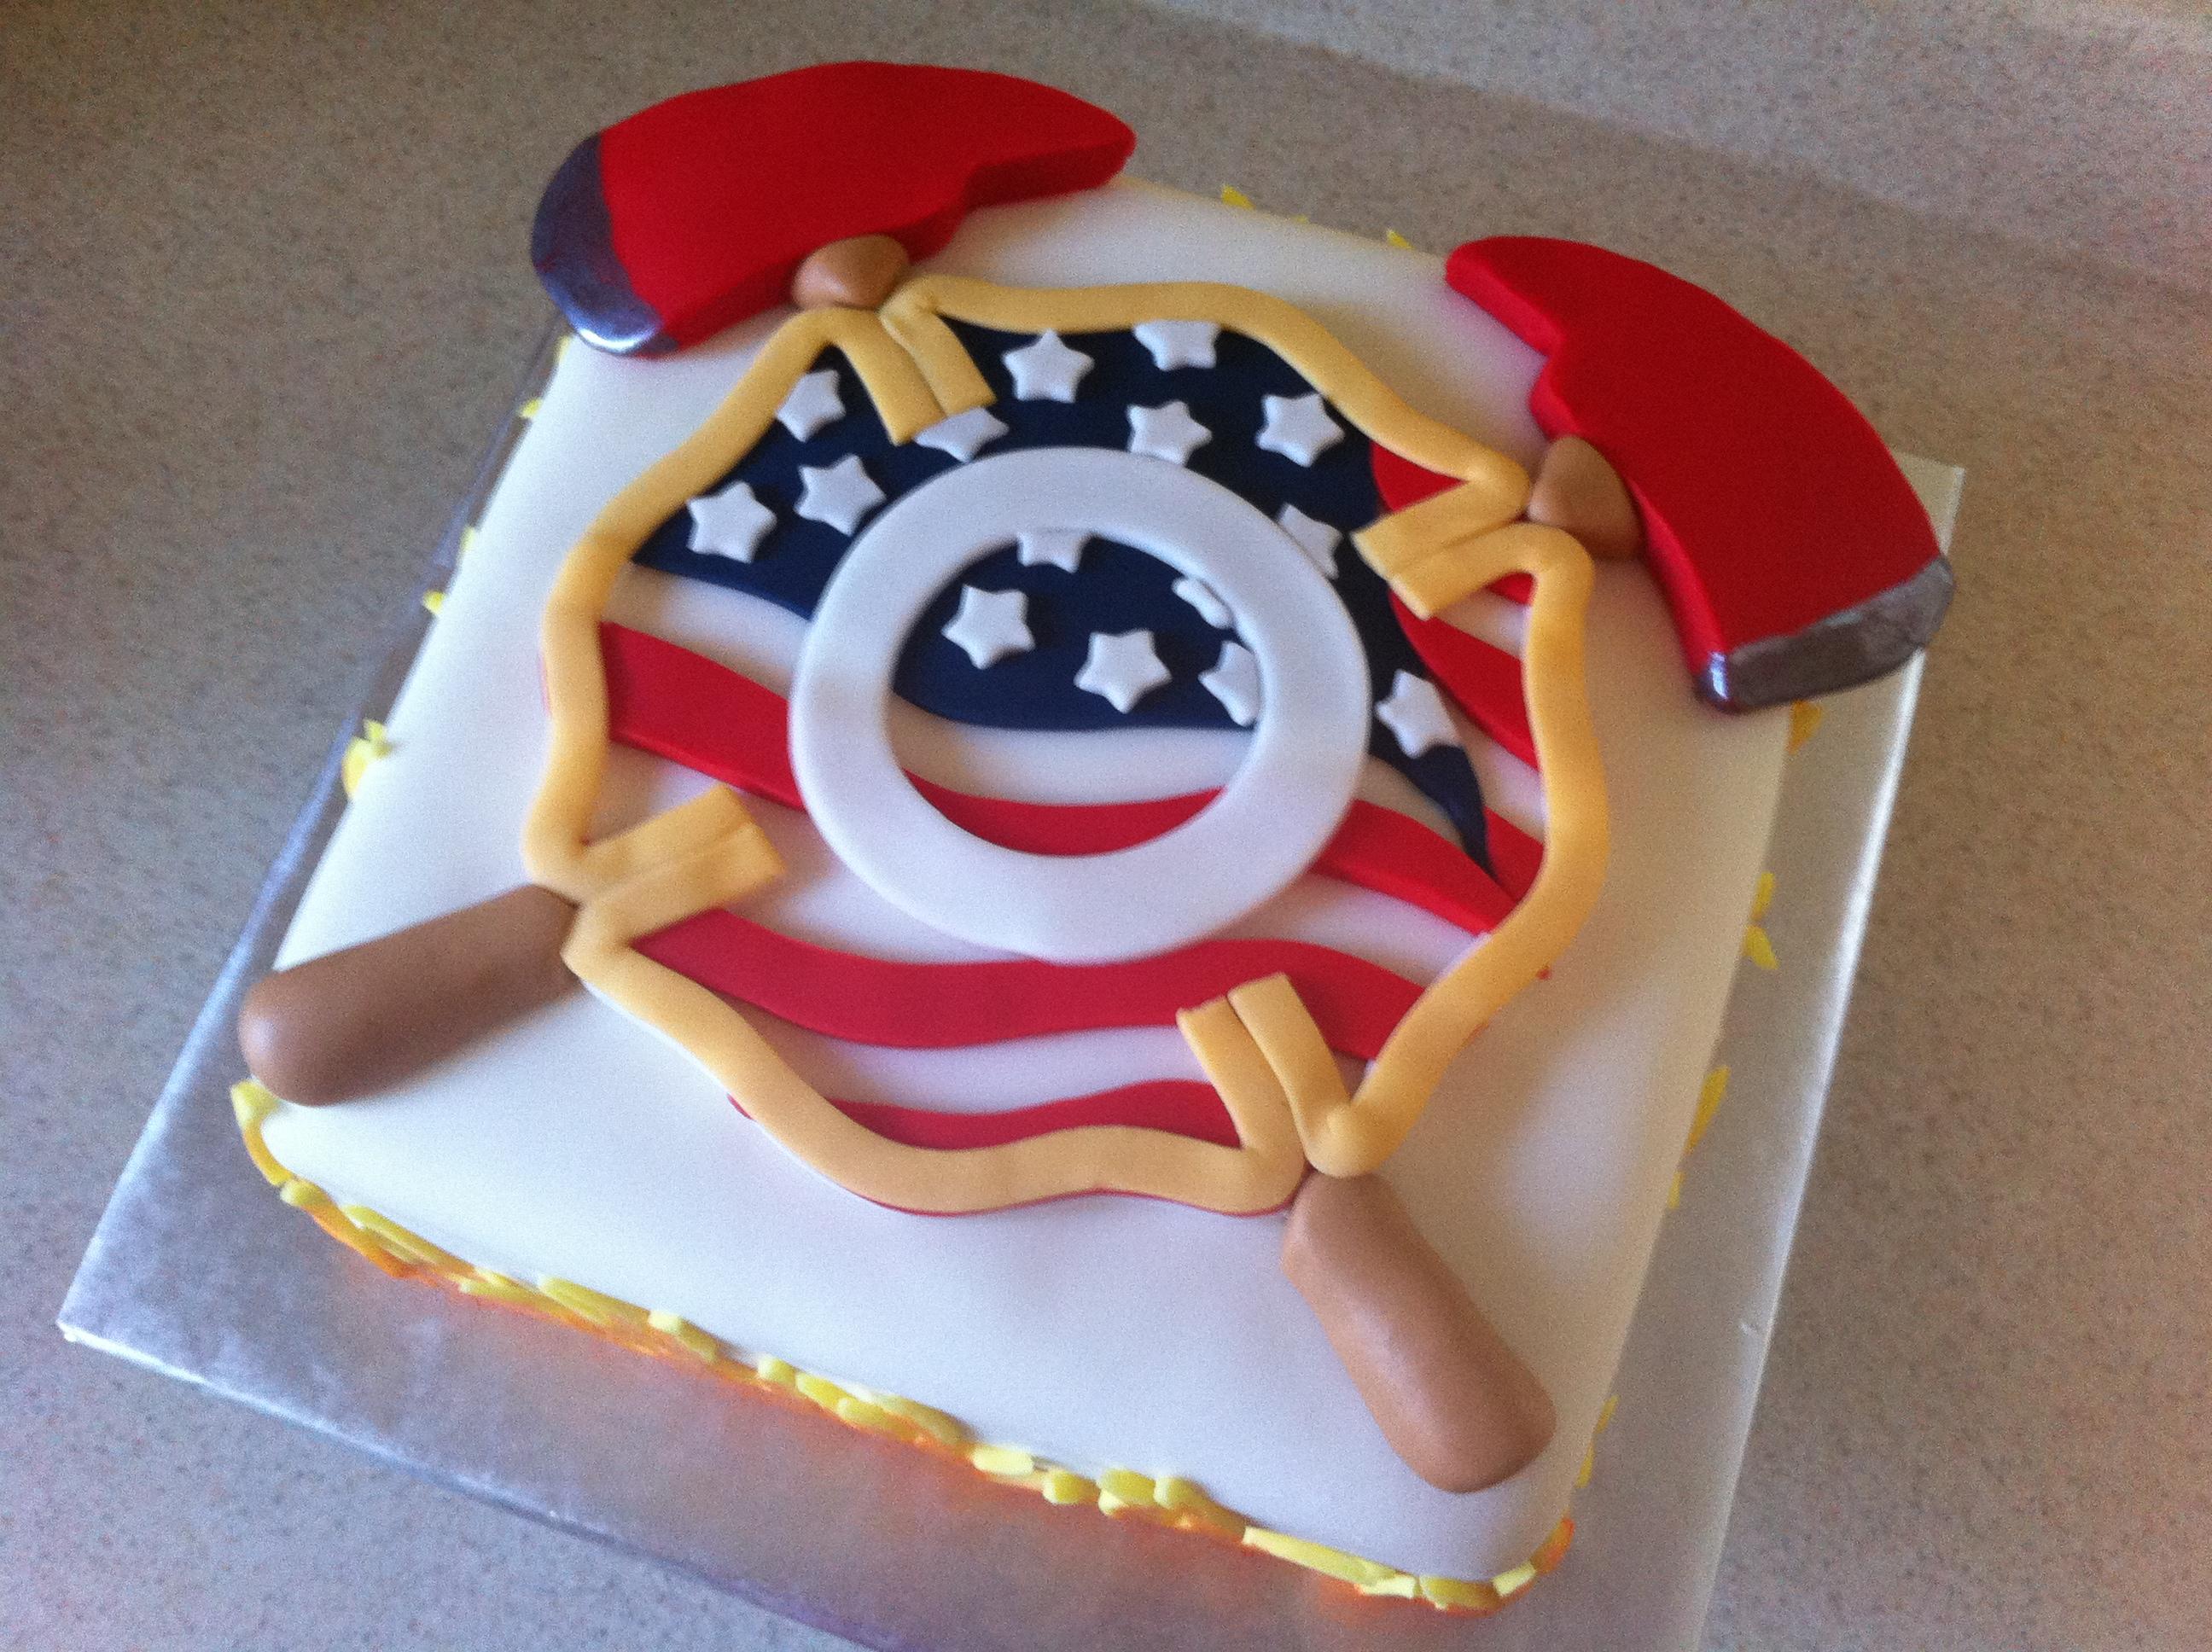 Fabulous Firefighter Cross Birthday Cake Lolos Cakes Sweets Birthday Cards Printable Benkemecafe Filternl